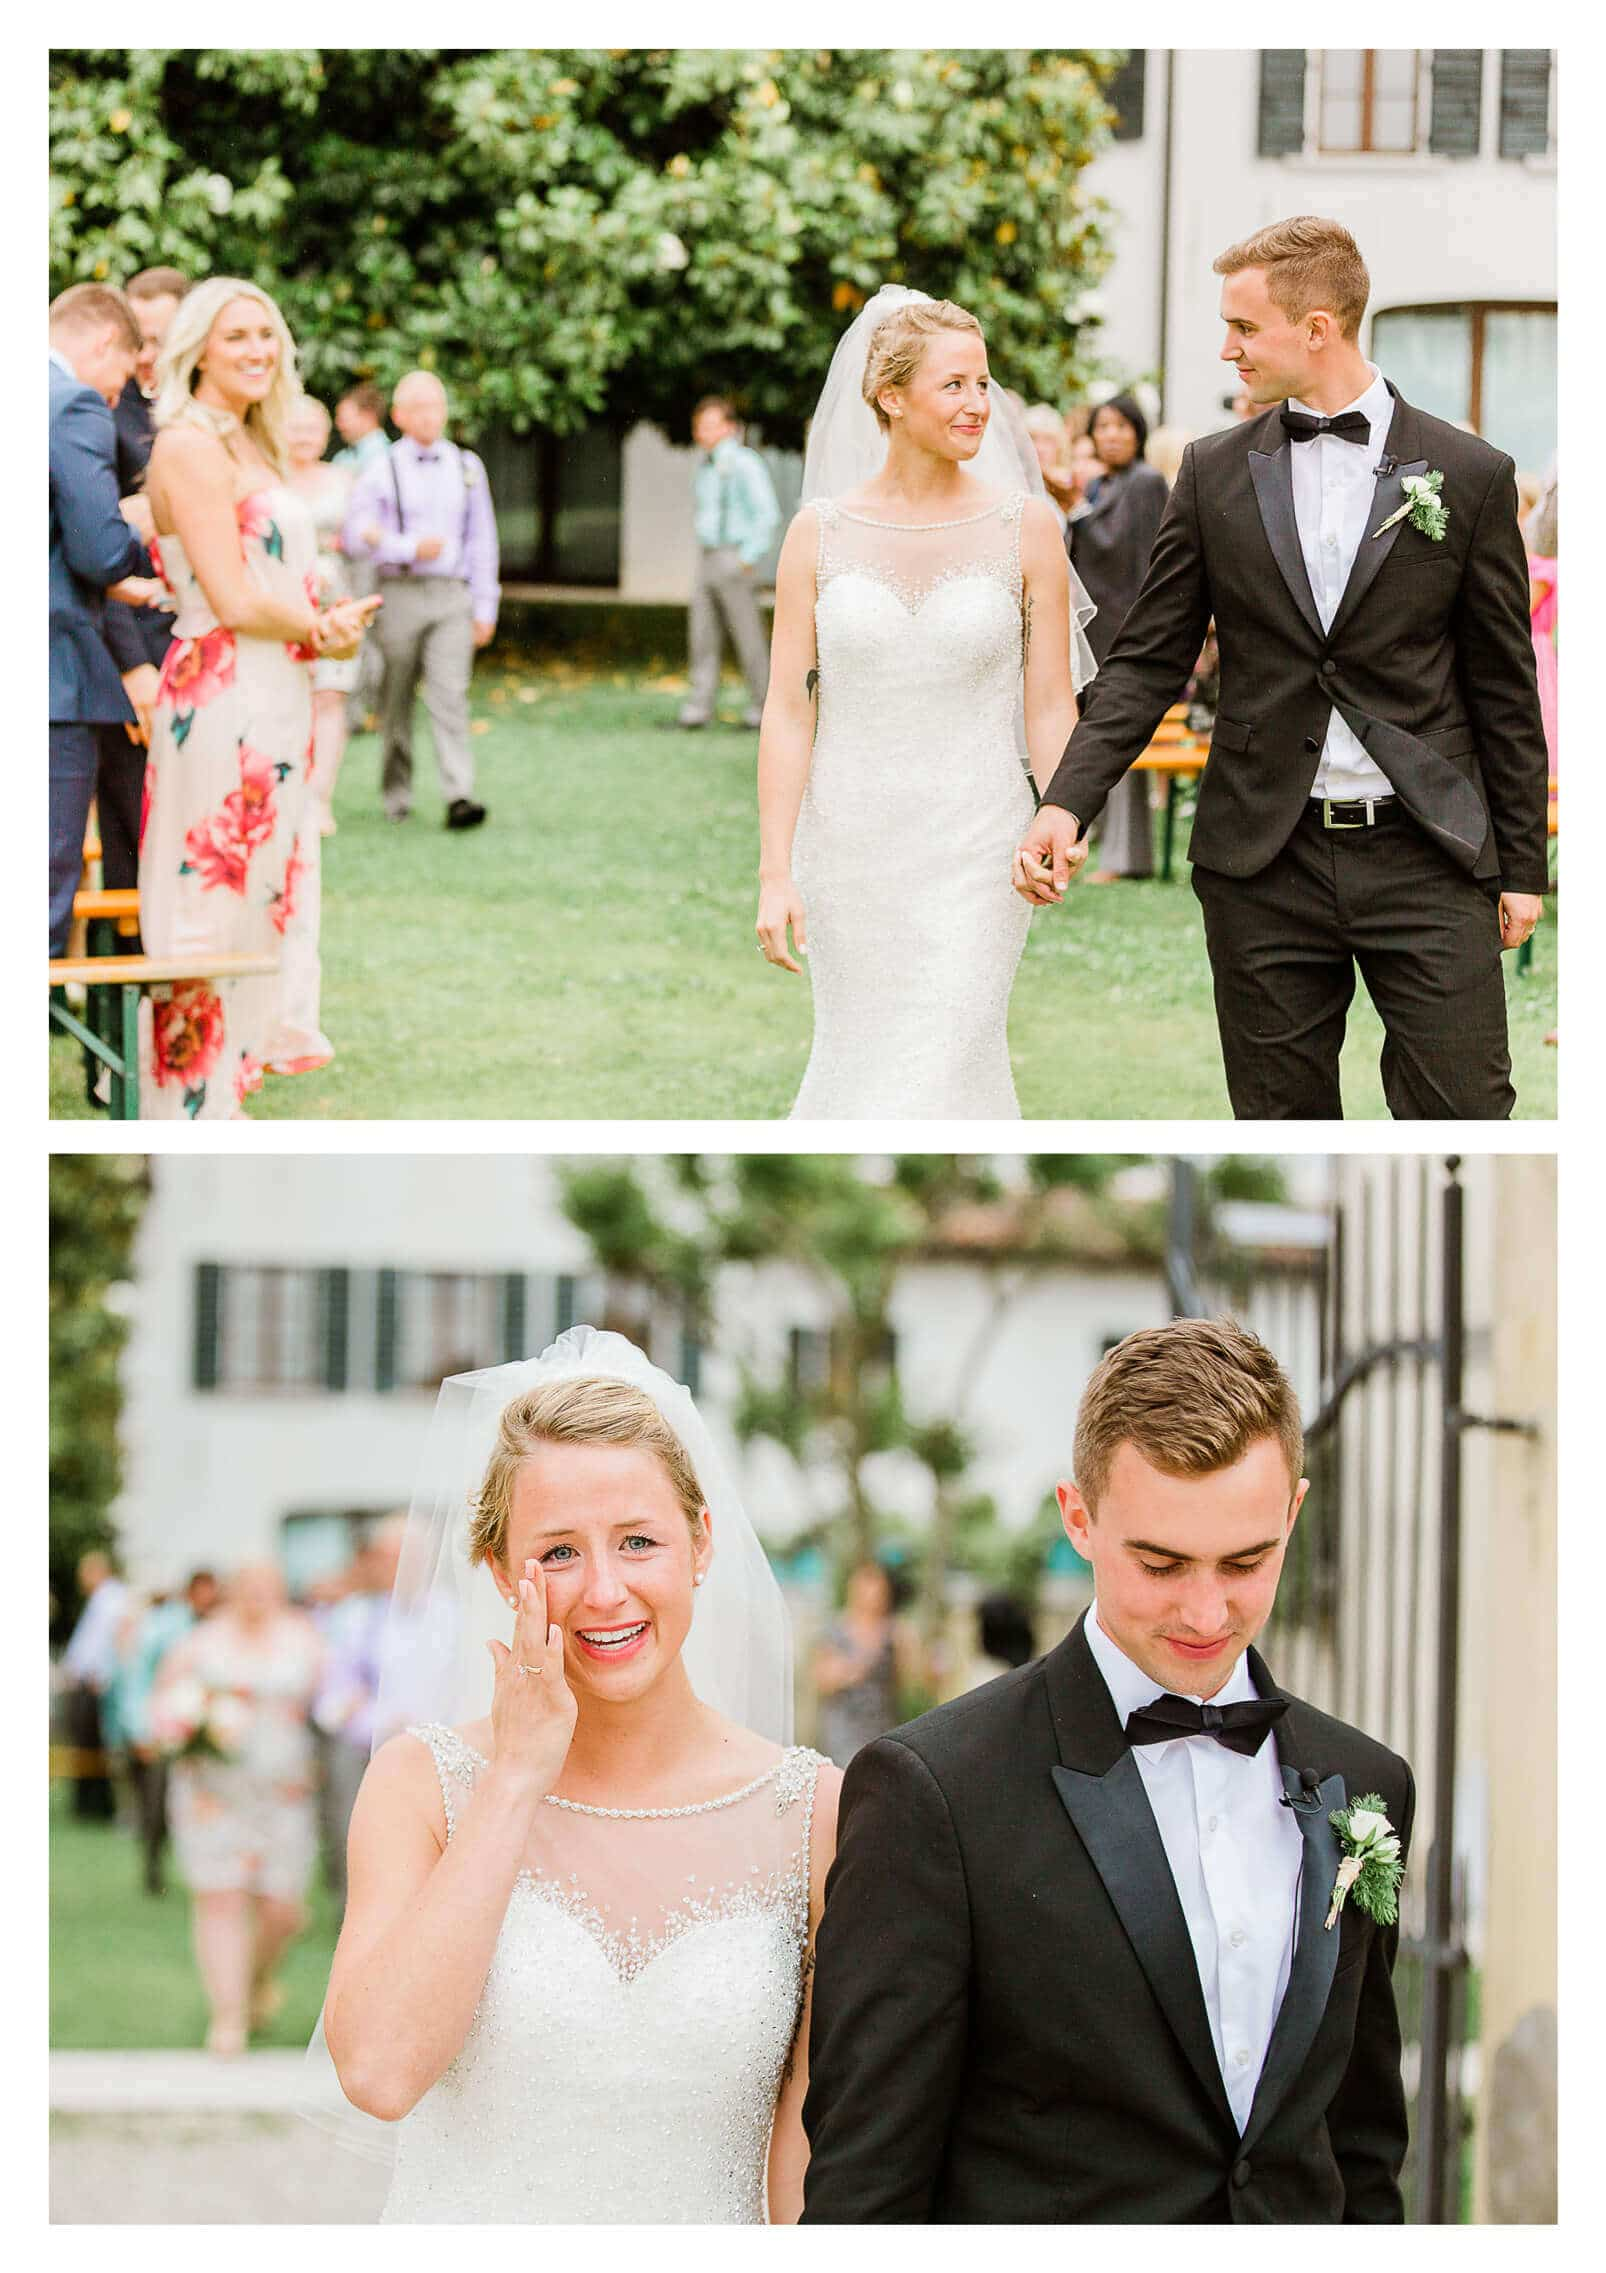 Emotional wedding ceremony at Fossa Mala in Pordenone | Italy destination photographer